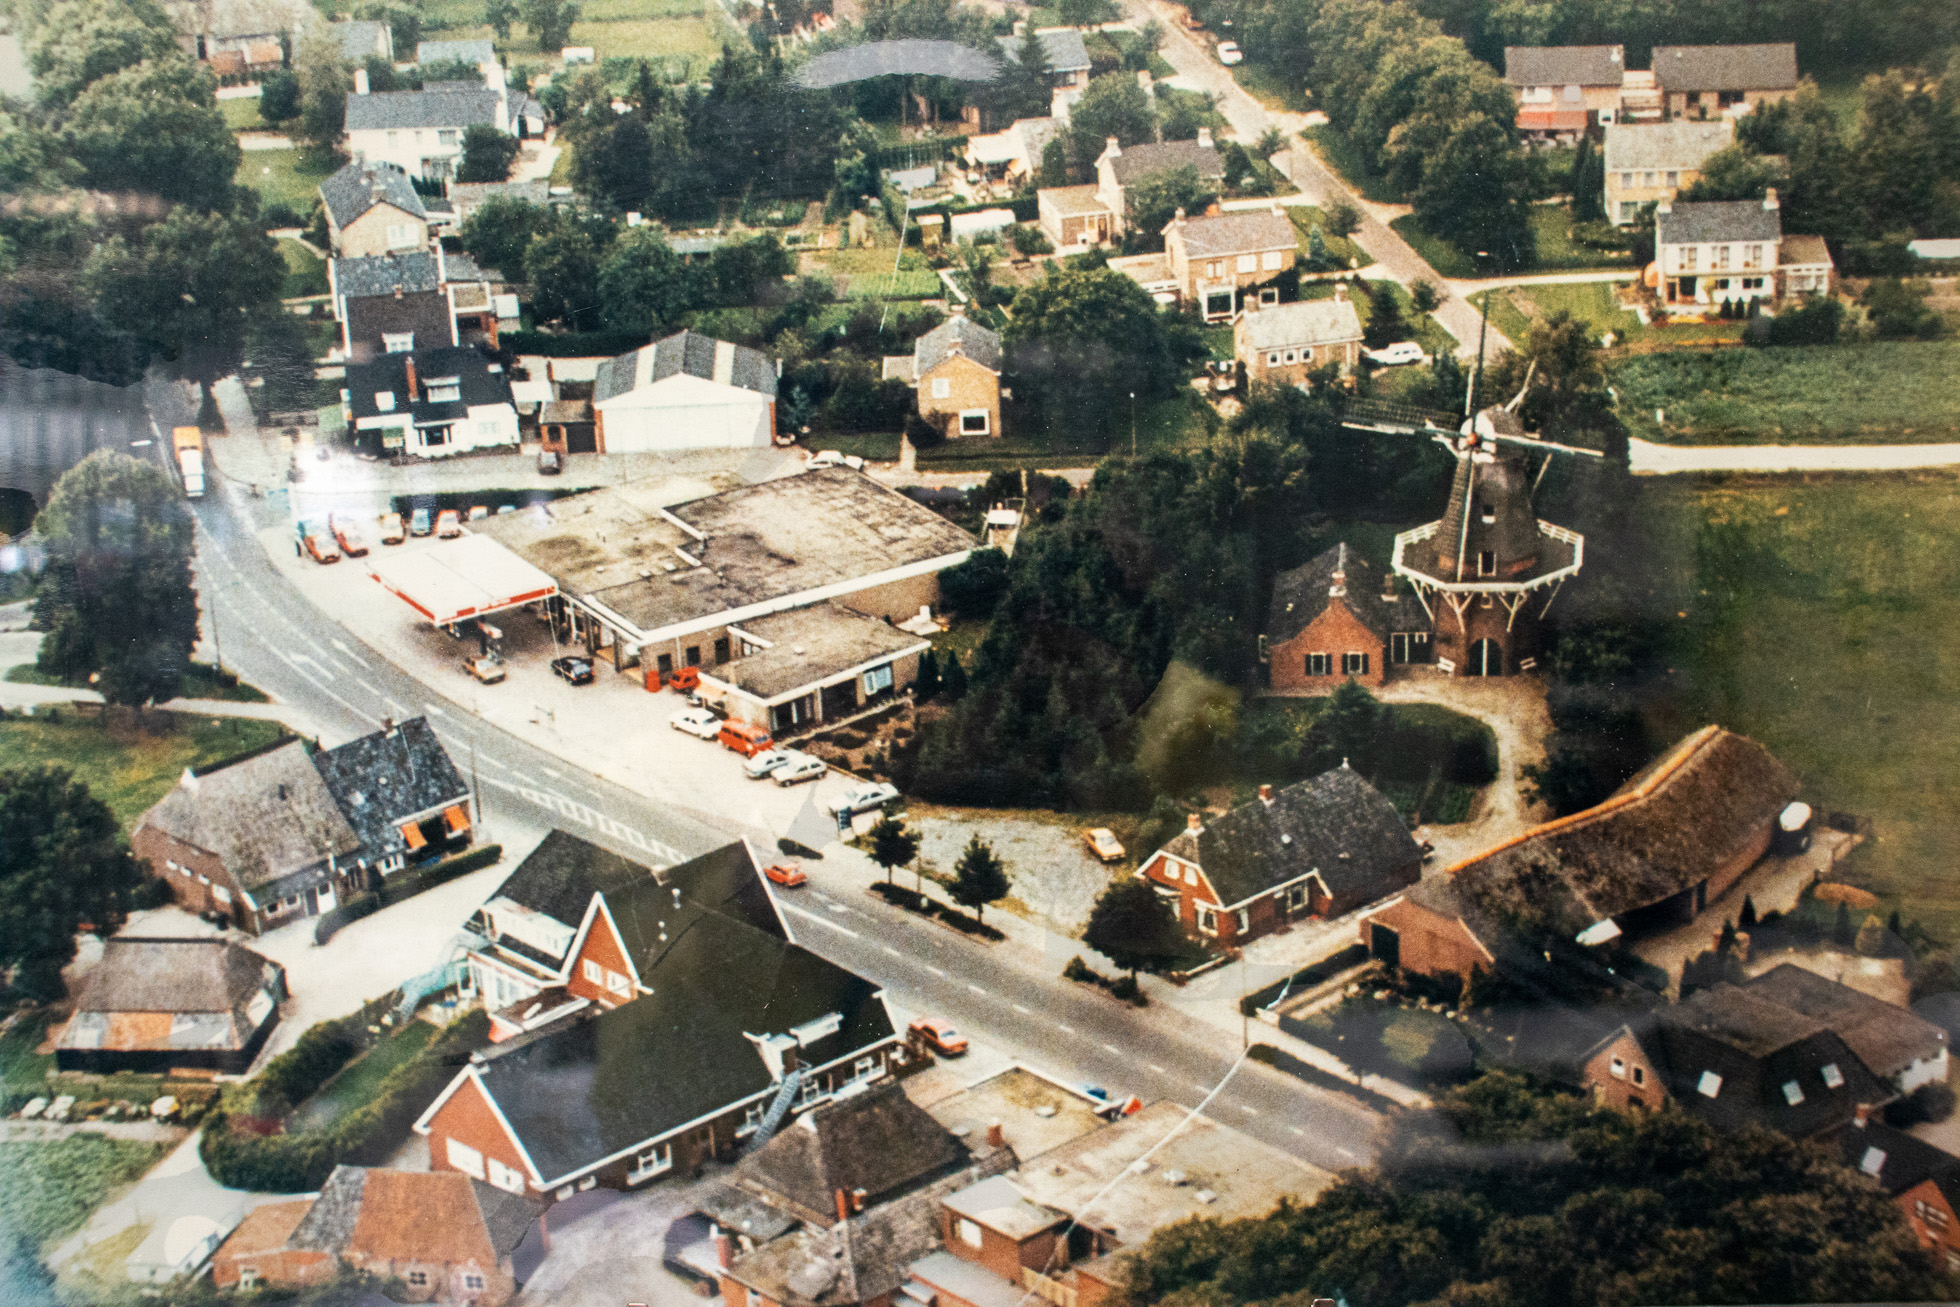 Garage-Dorenbos-Norg-Drenthe-historie-6824